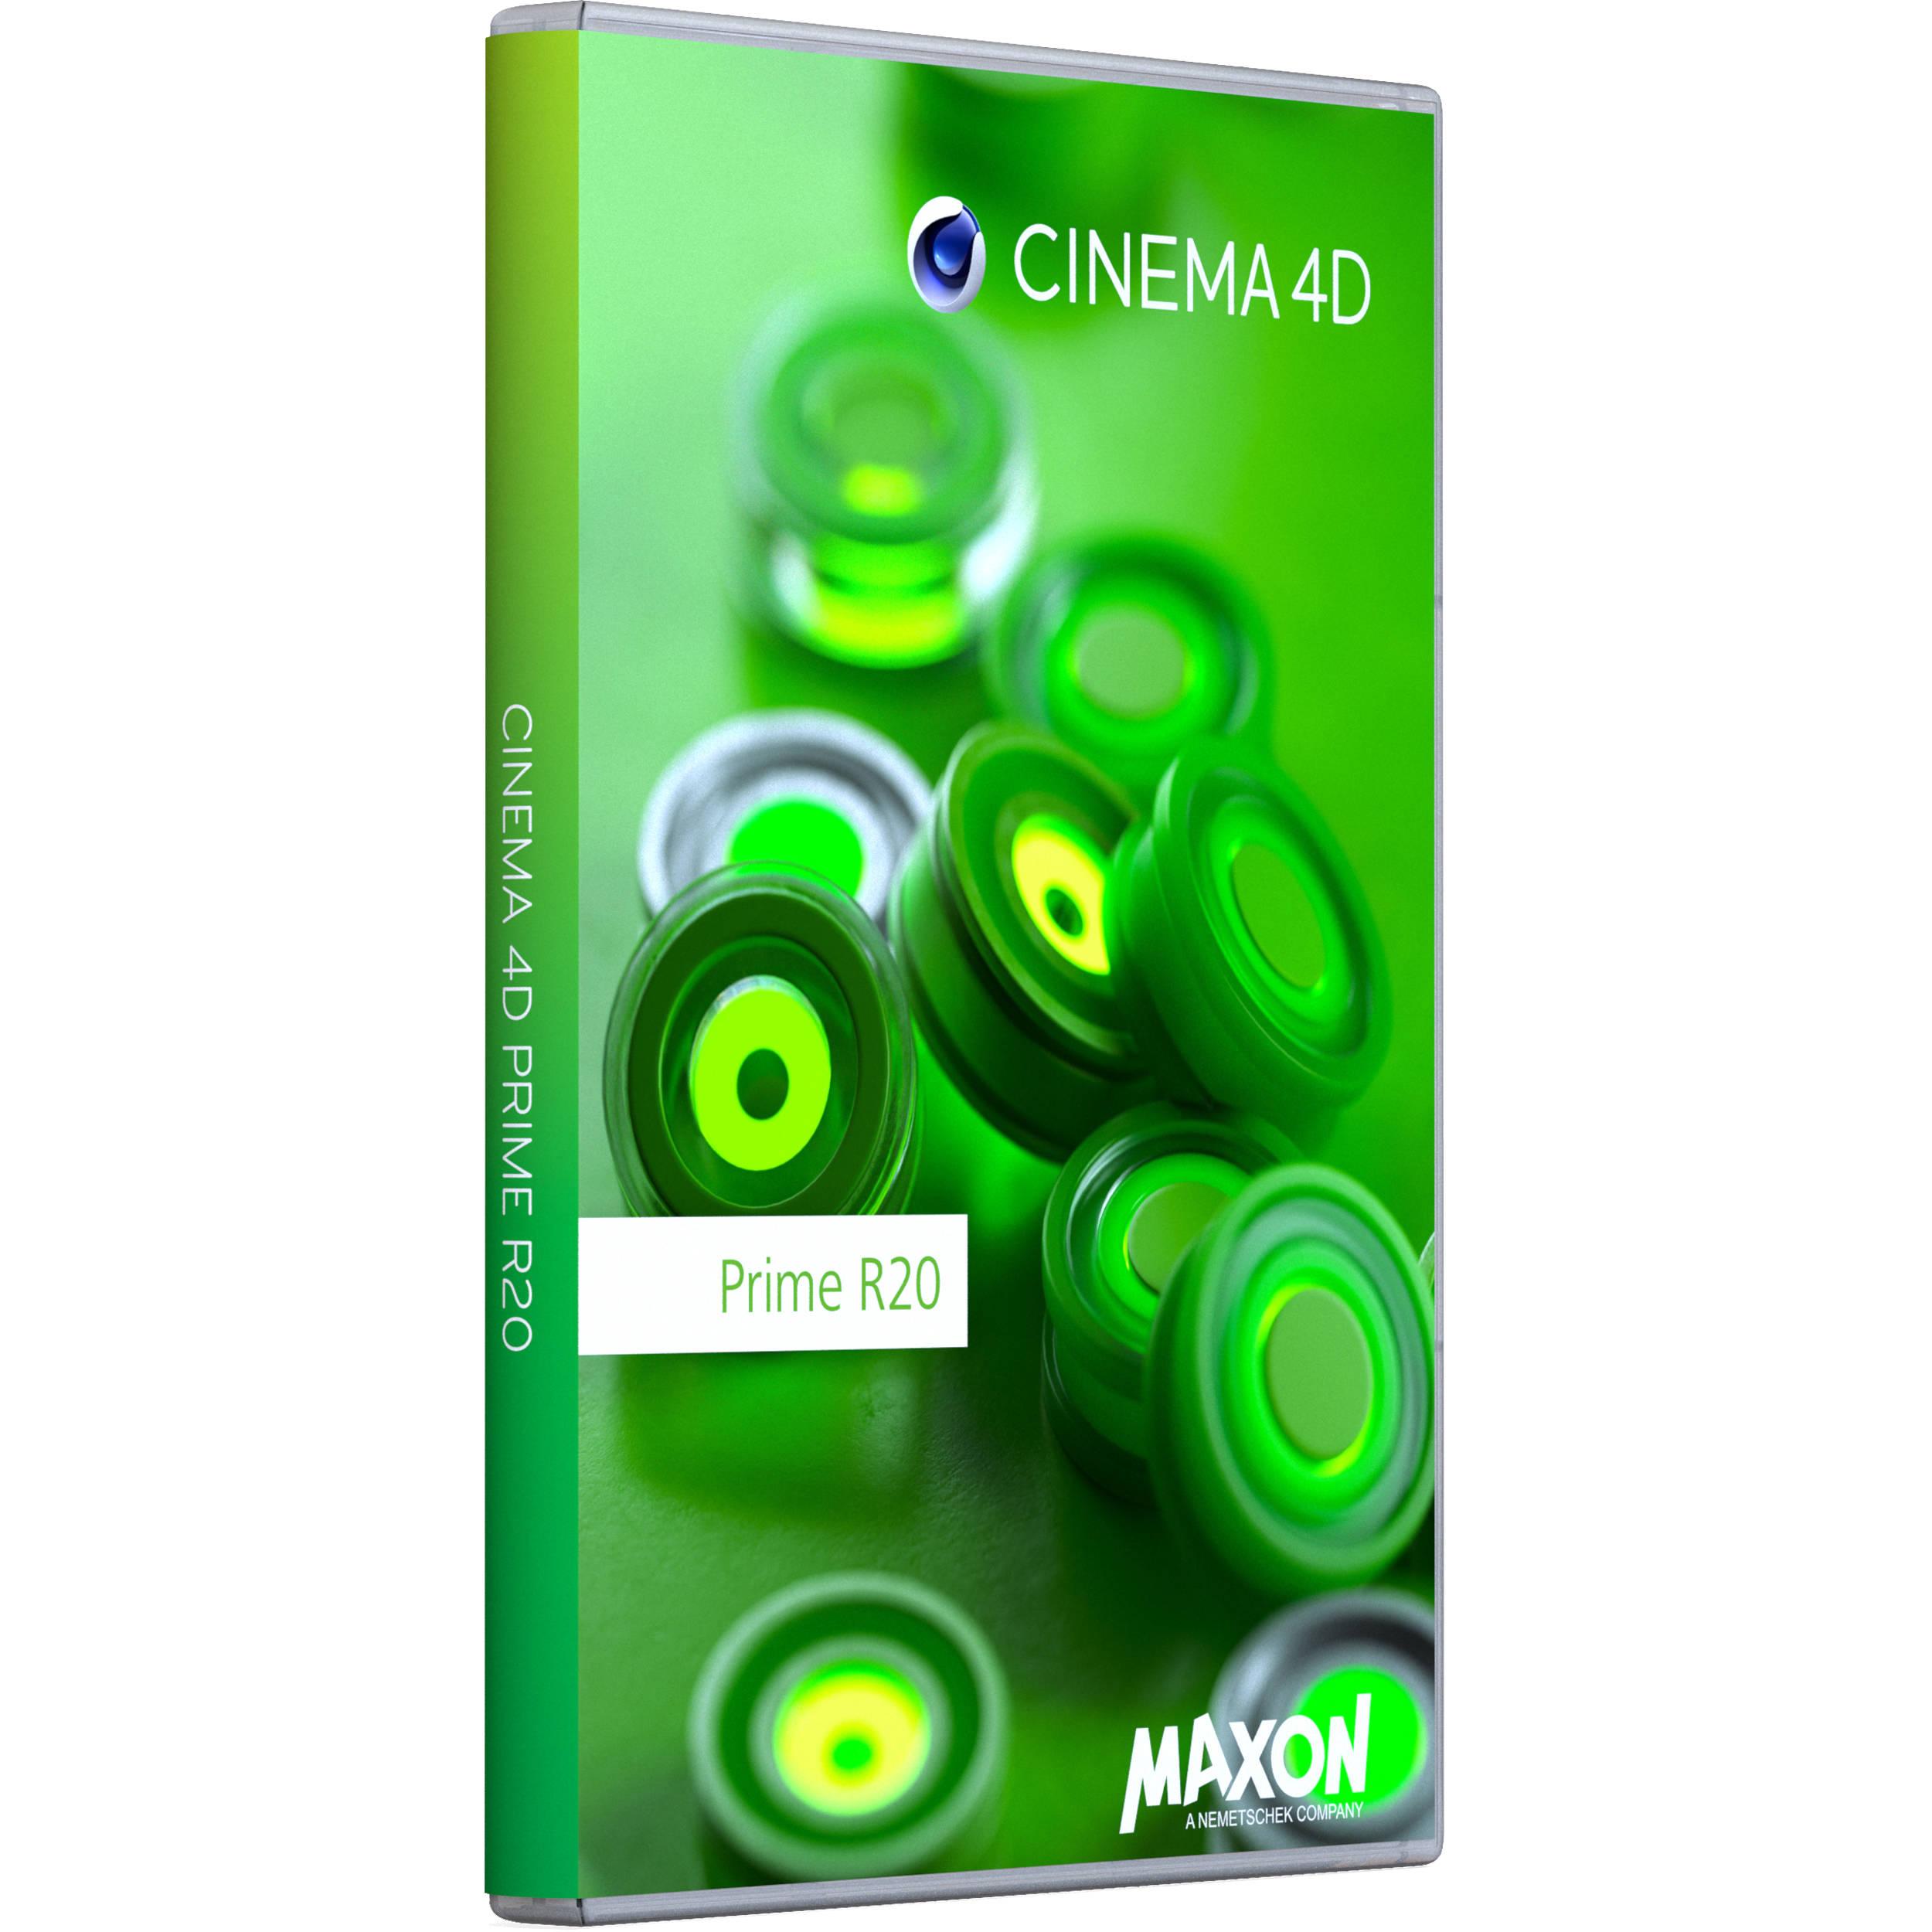 Maxon Cinema 4d Prime R20 Download C4d N 20 B H Photo Video